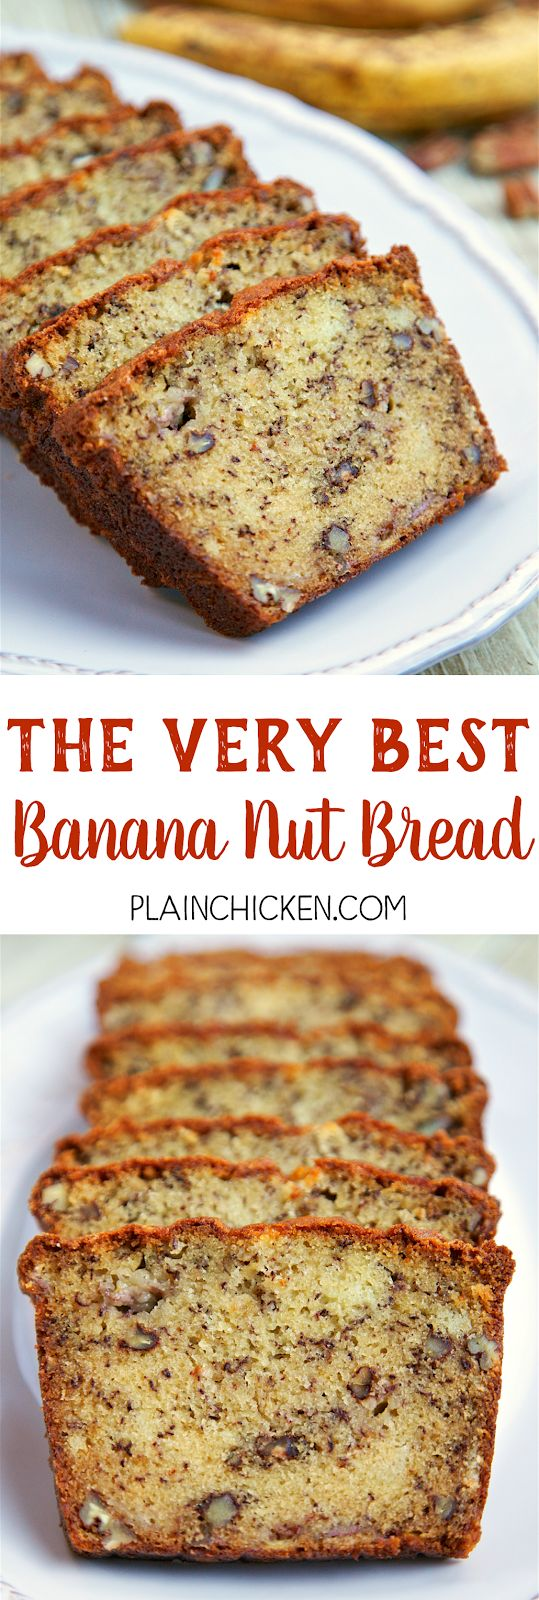 The Very Best Banana Nut Bread